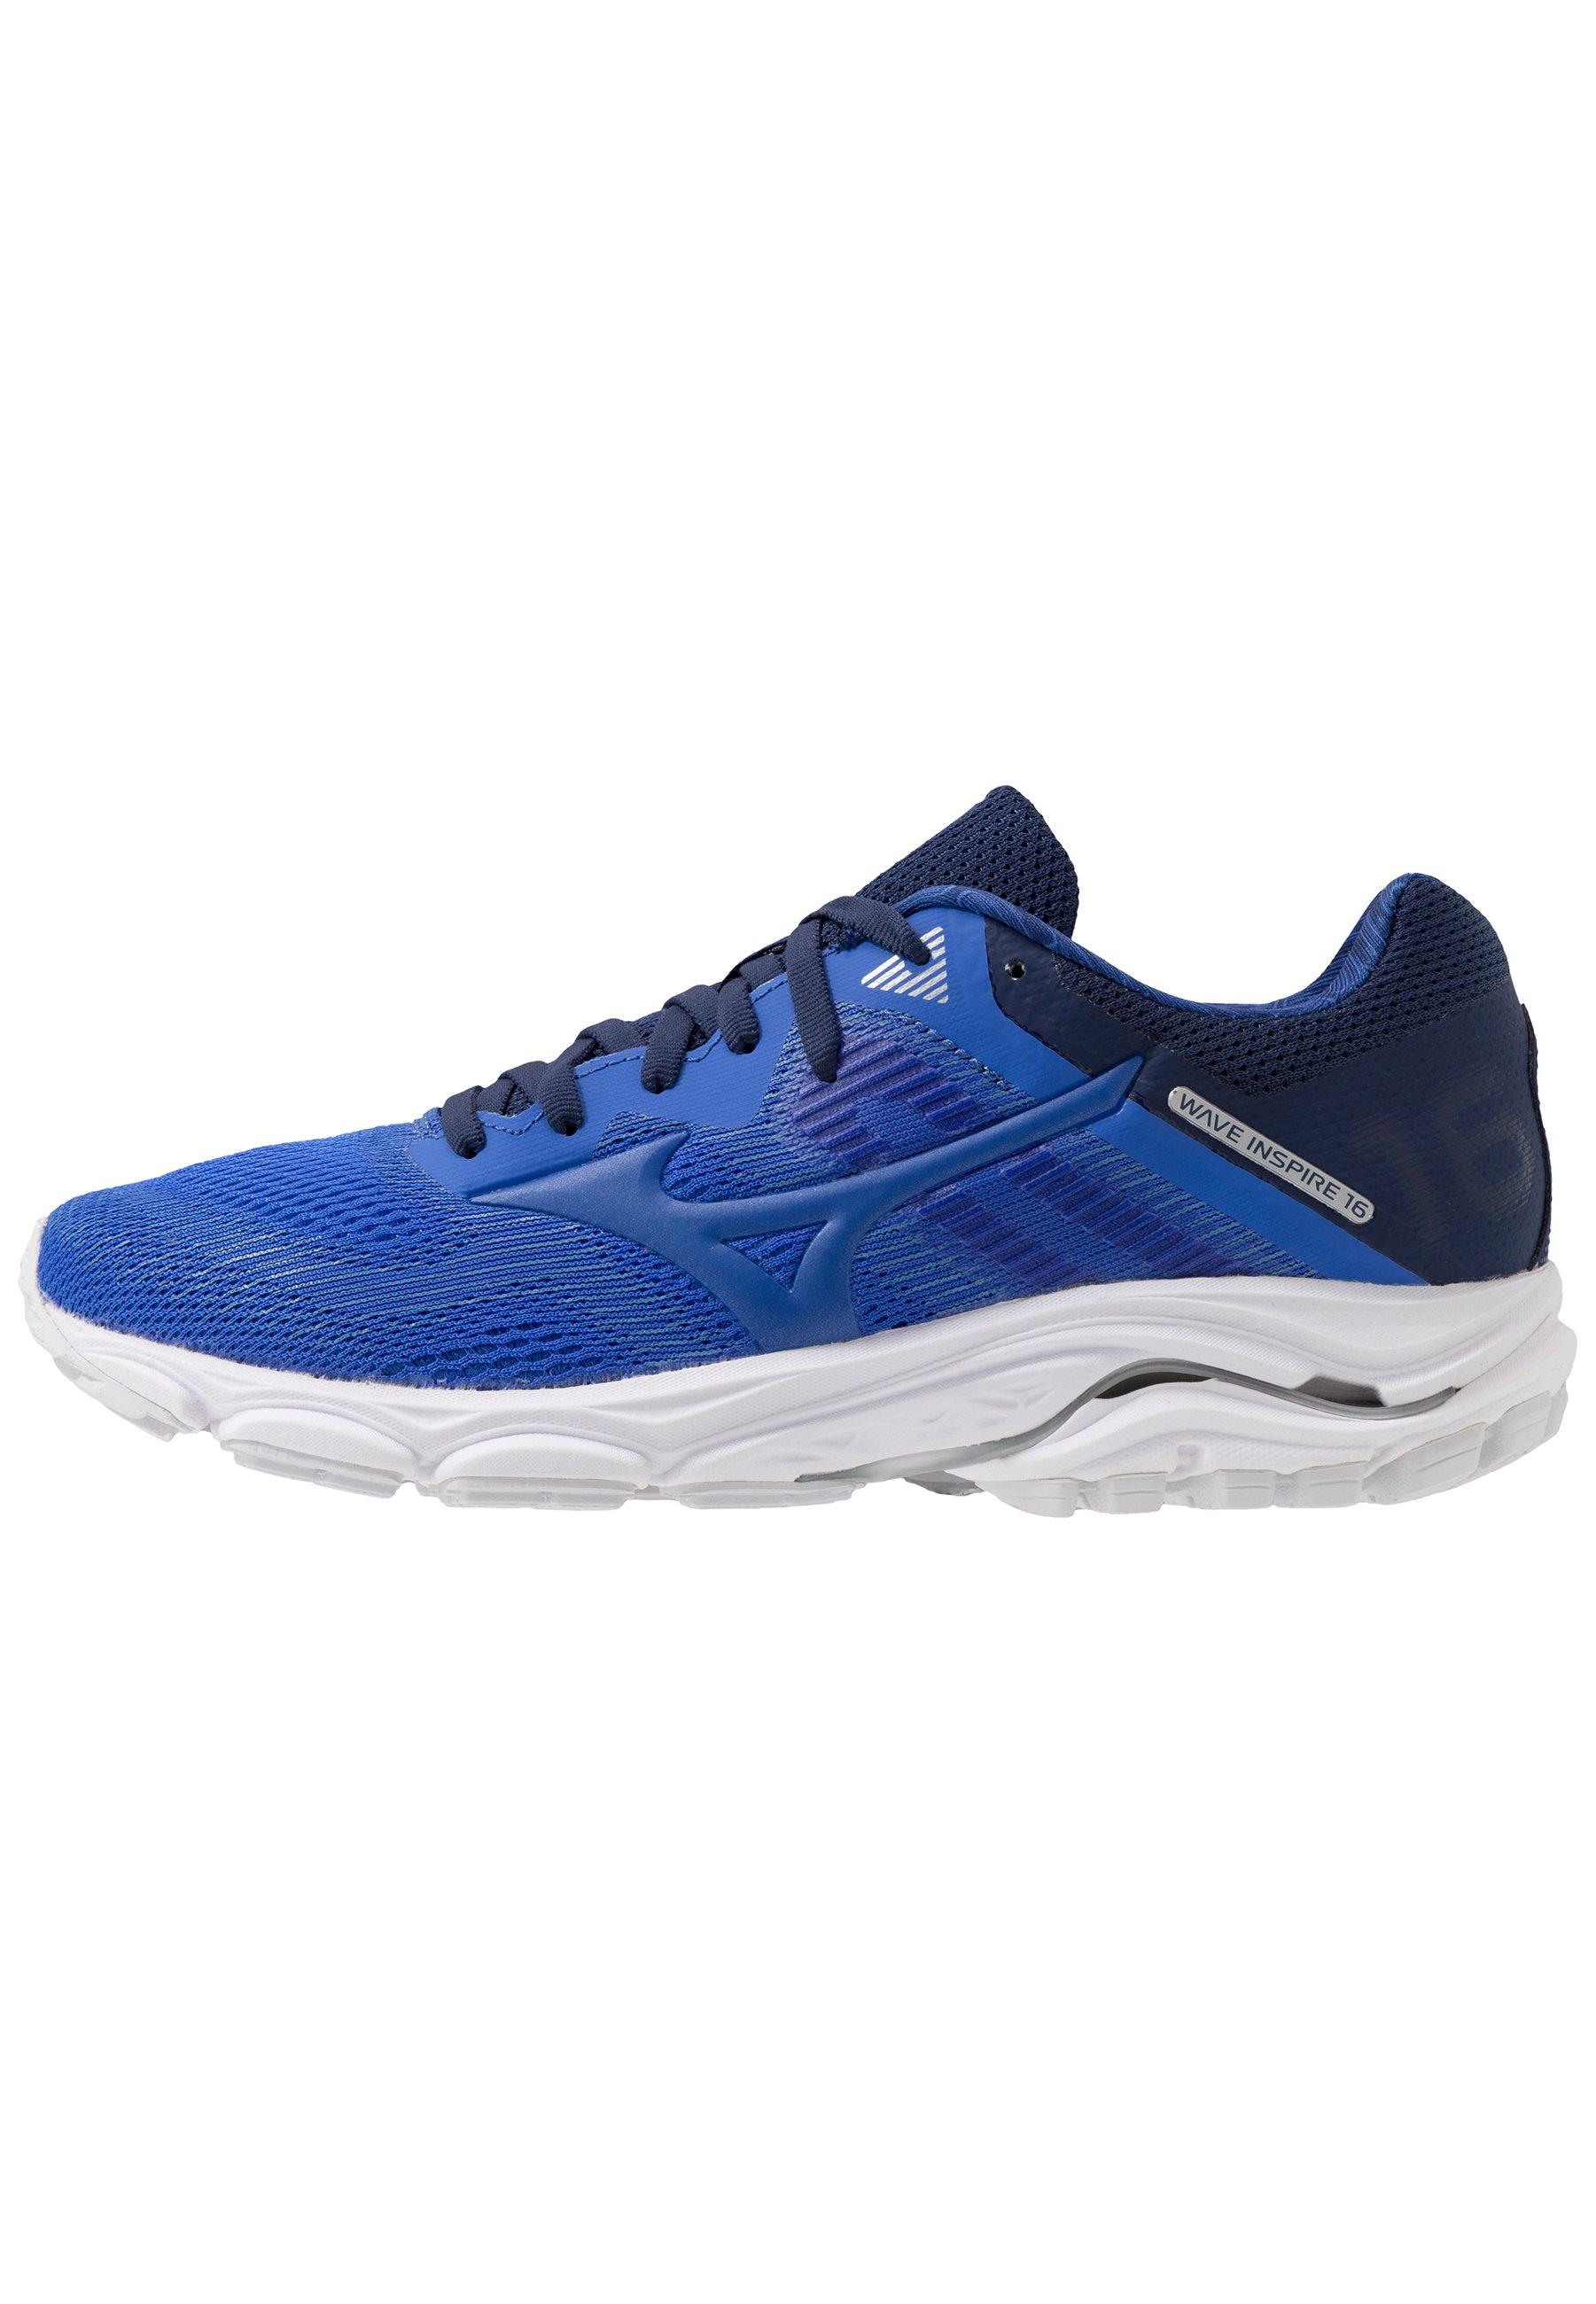 Mizuno WAVE INSPIRE 16 Nøytrale løpesko dazzling blue